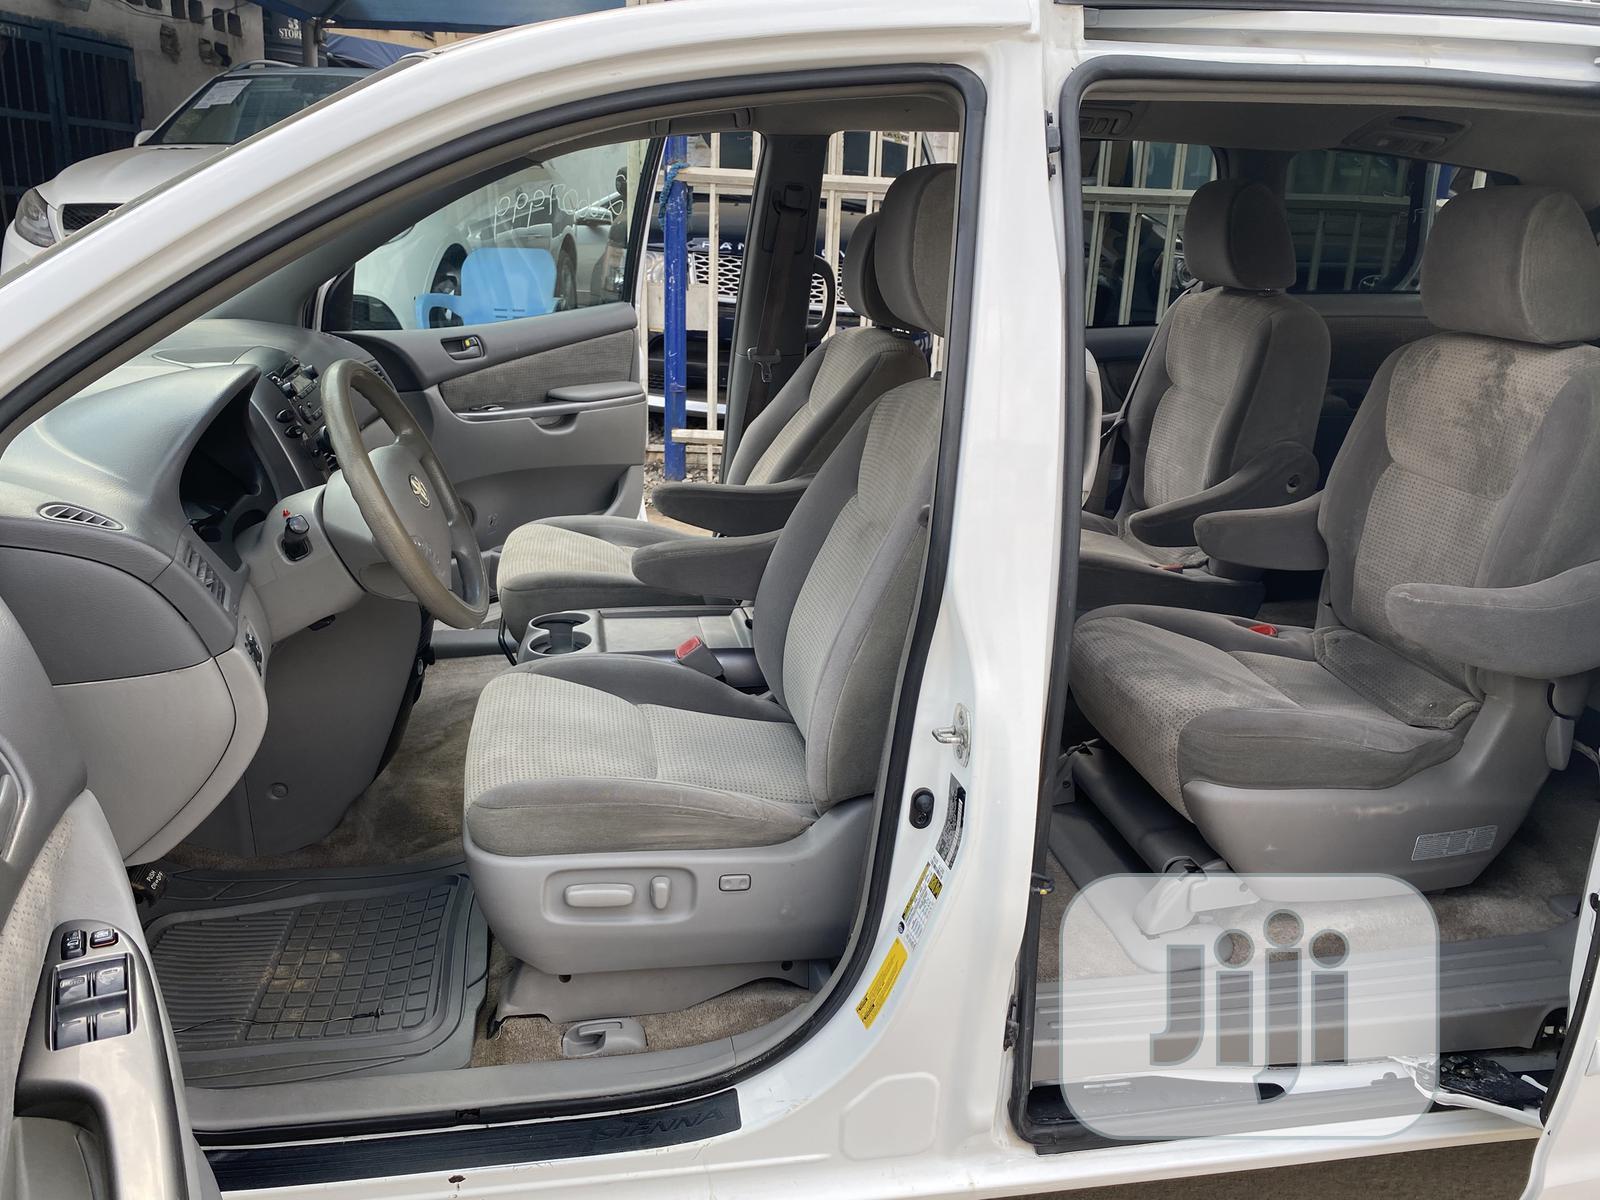 Toyota Sienna LE AWD 2009 White | Cars for sale in Amuwo-Odofin, Lagos State, Nigeria